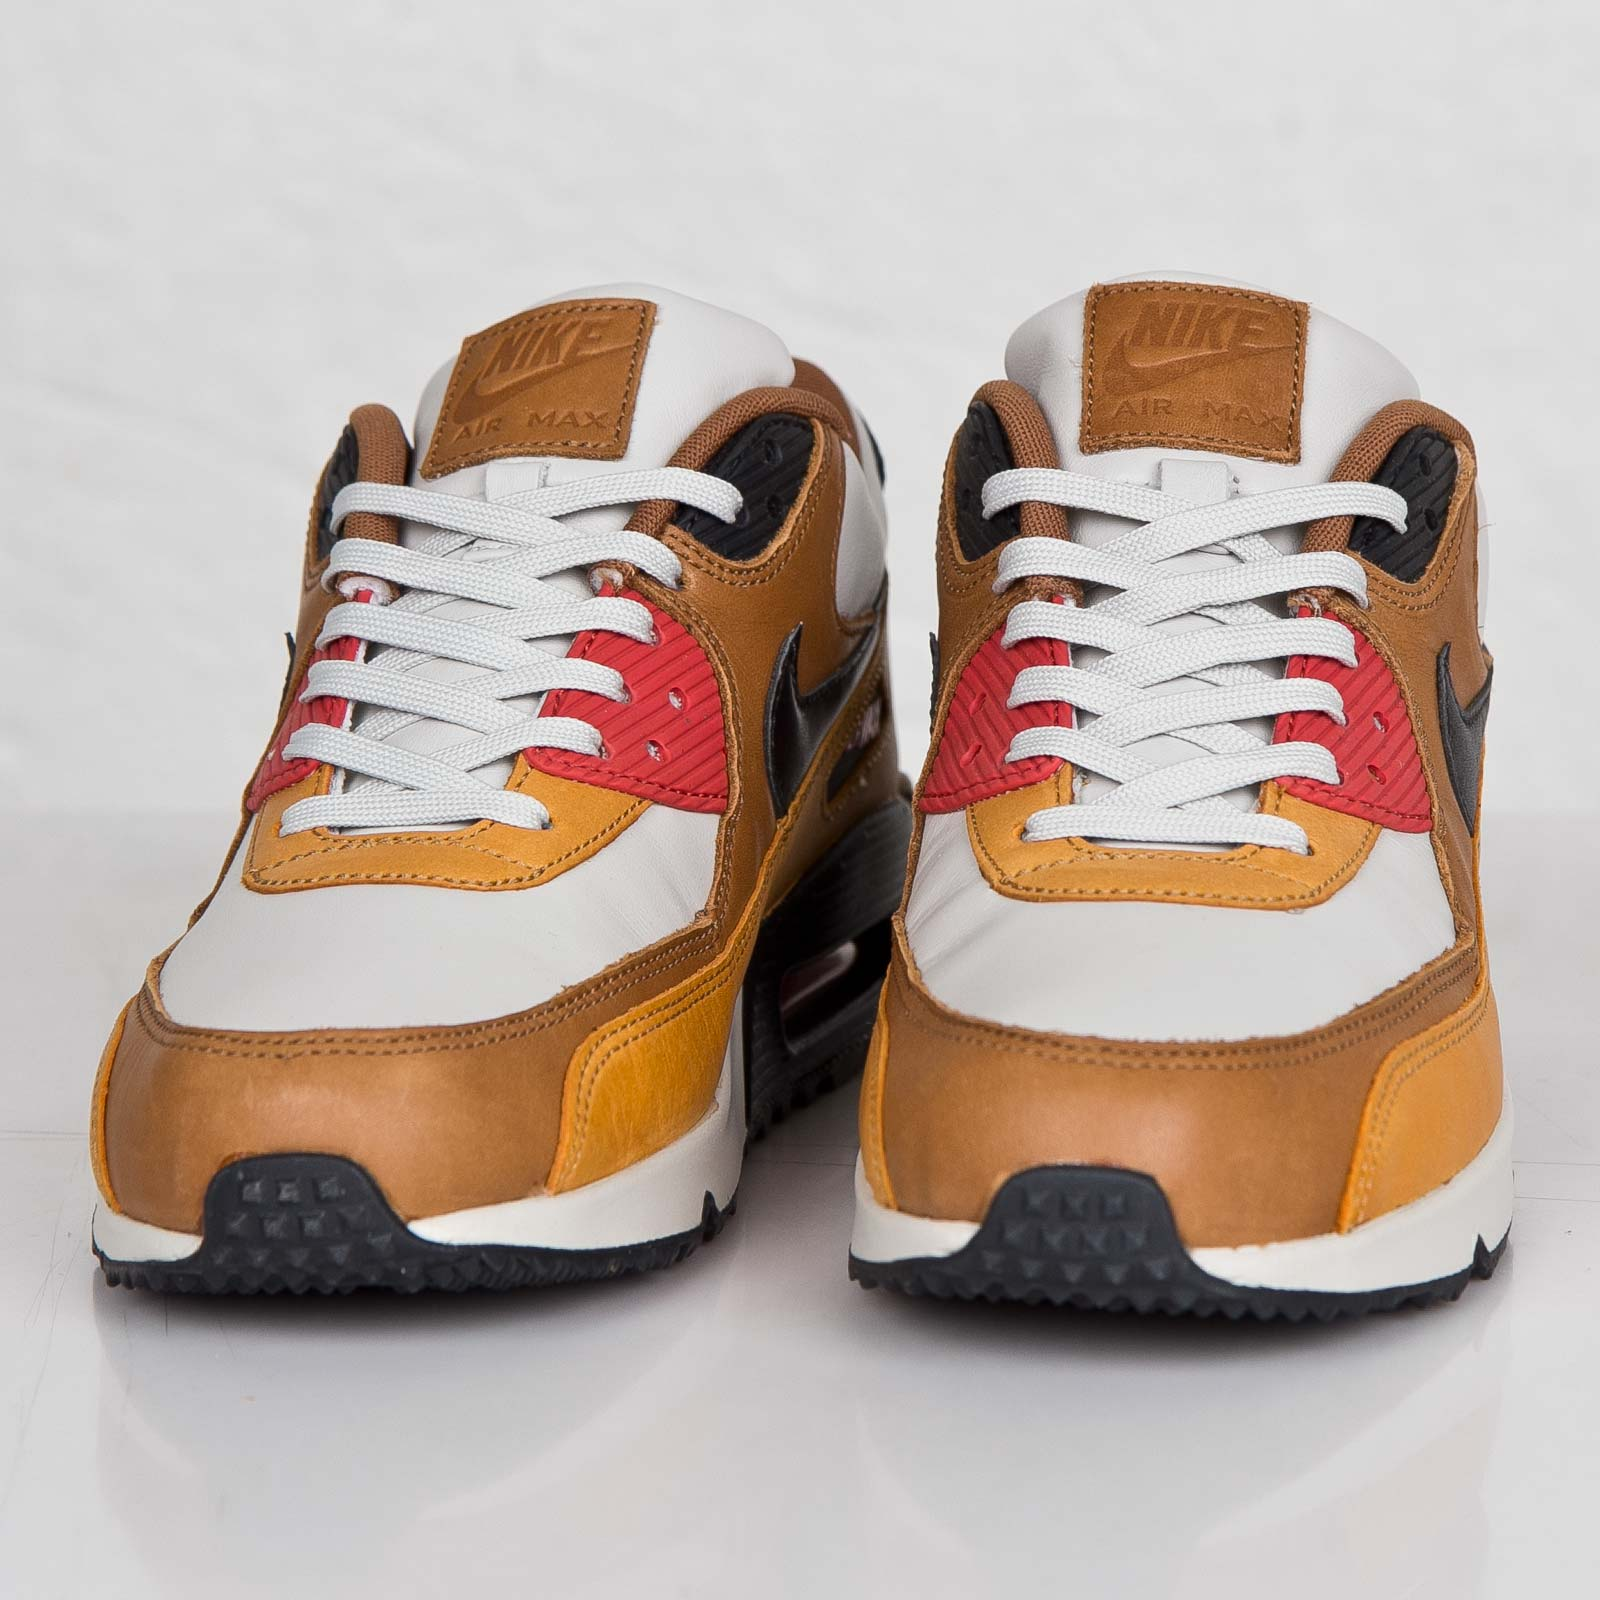 1f841e5c2d Nike Air Max 90 Escape QS - 718303-002 - Sneakersnstuff   sneakers &  streetwear online since 1999